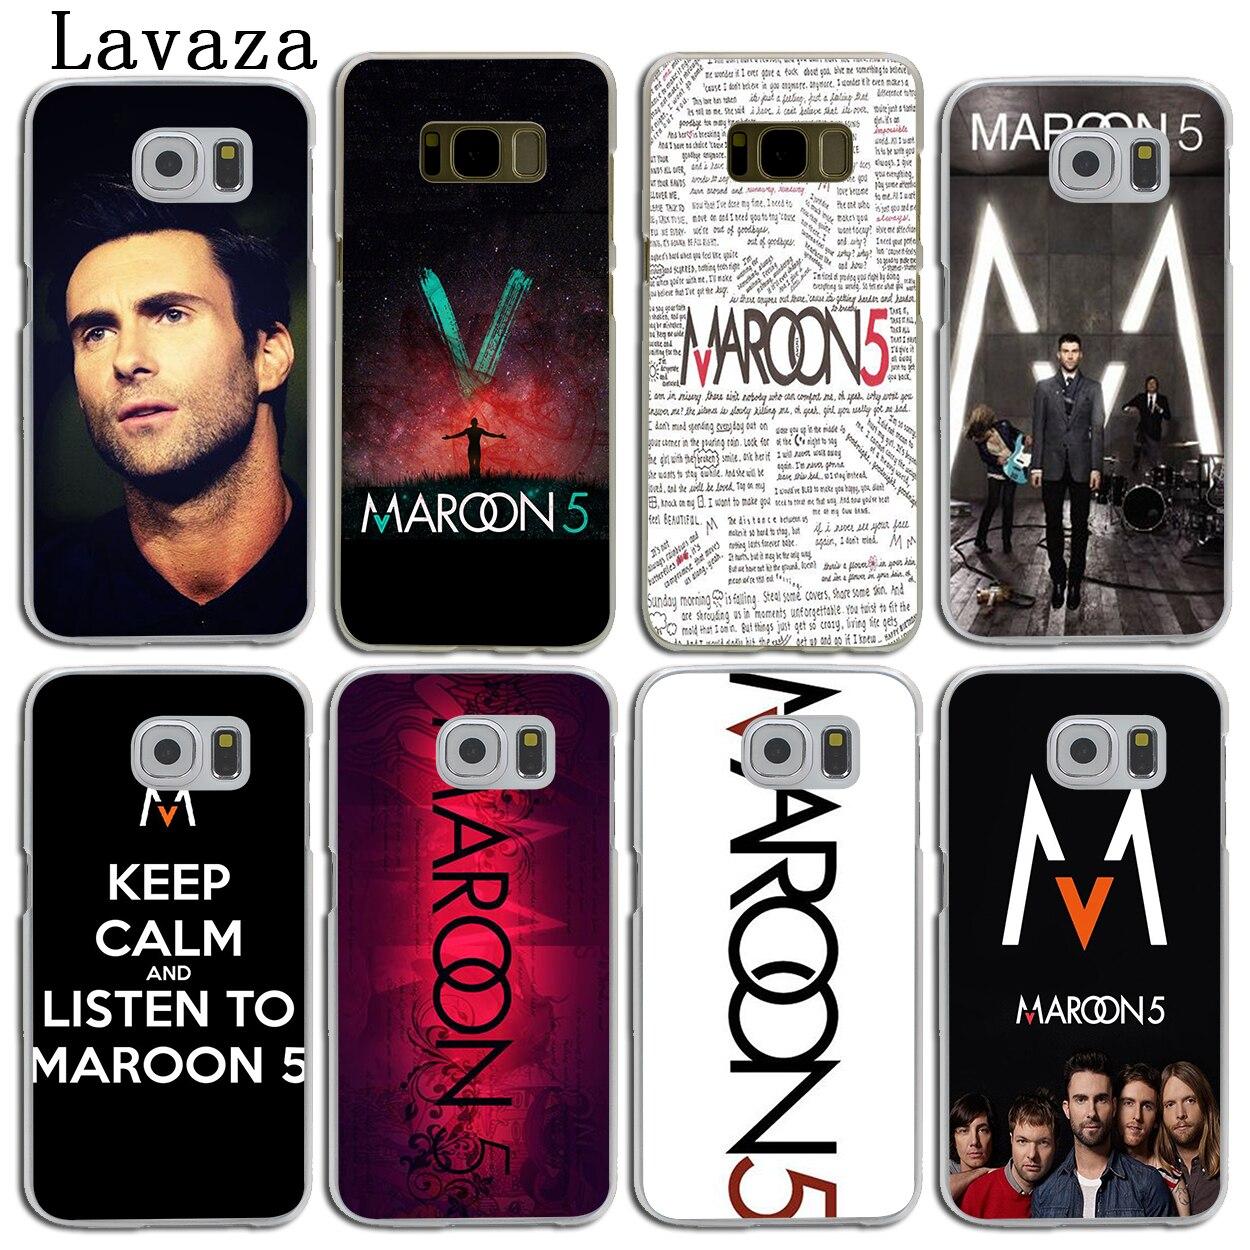 Lavaza maroon 5 Hard Skin Phone Shell Case for Samsung Galaxy S7 S6 Edge S8 S9 Plus S3 S4 S5 & Mini S9 Cover